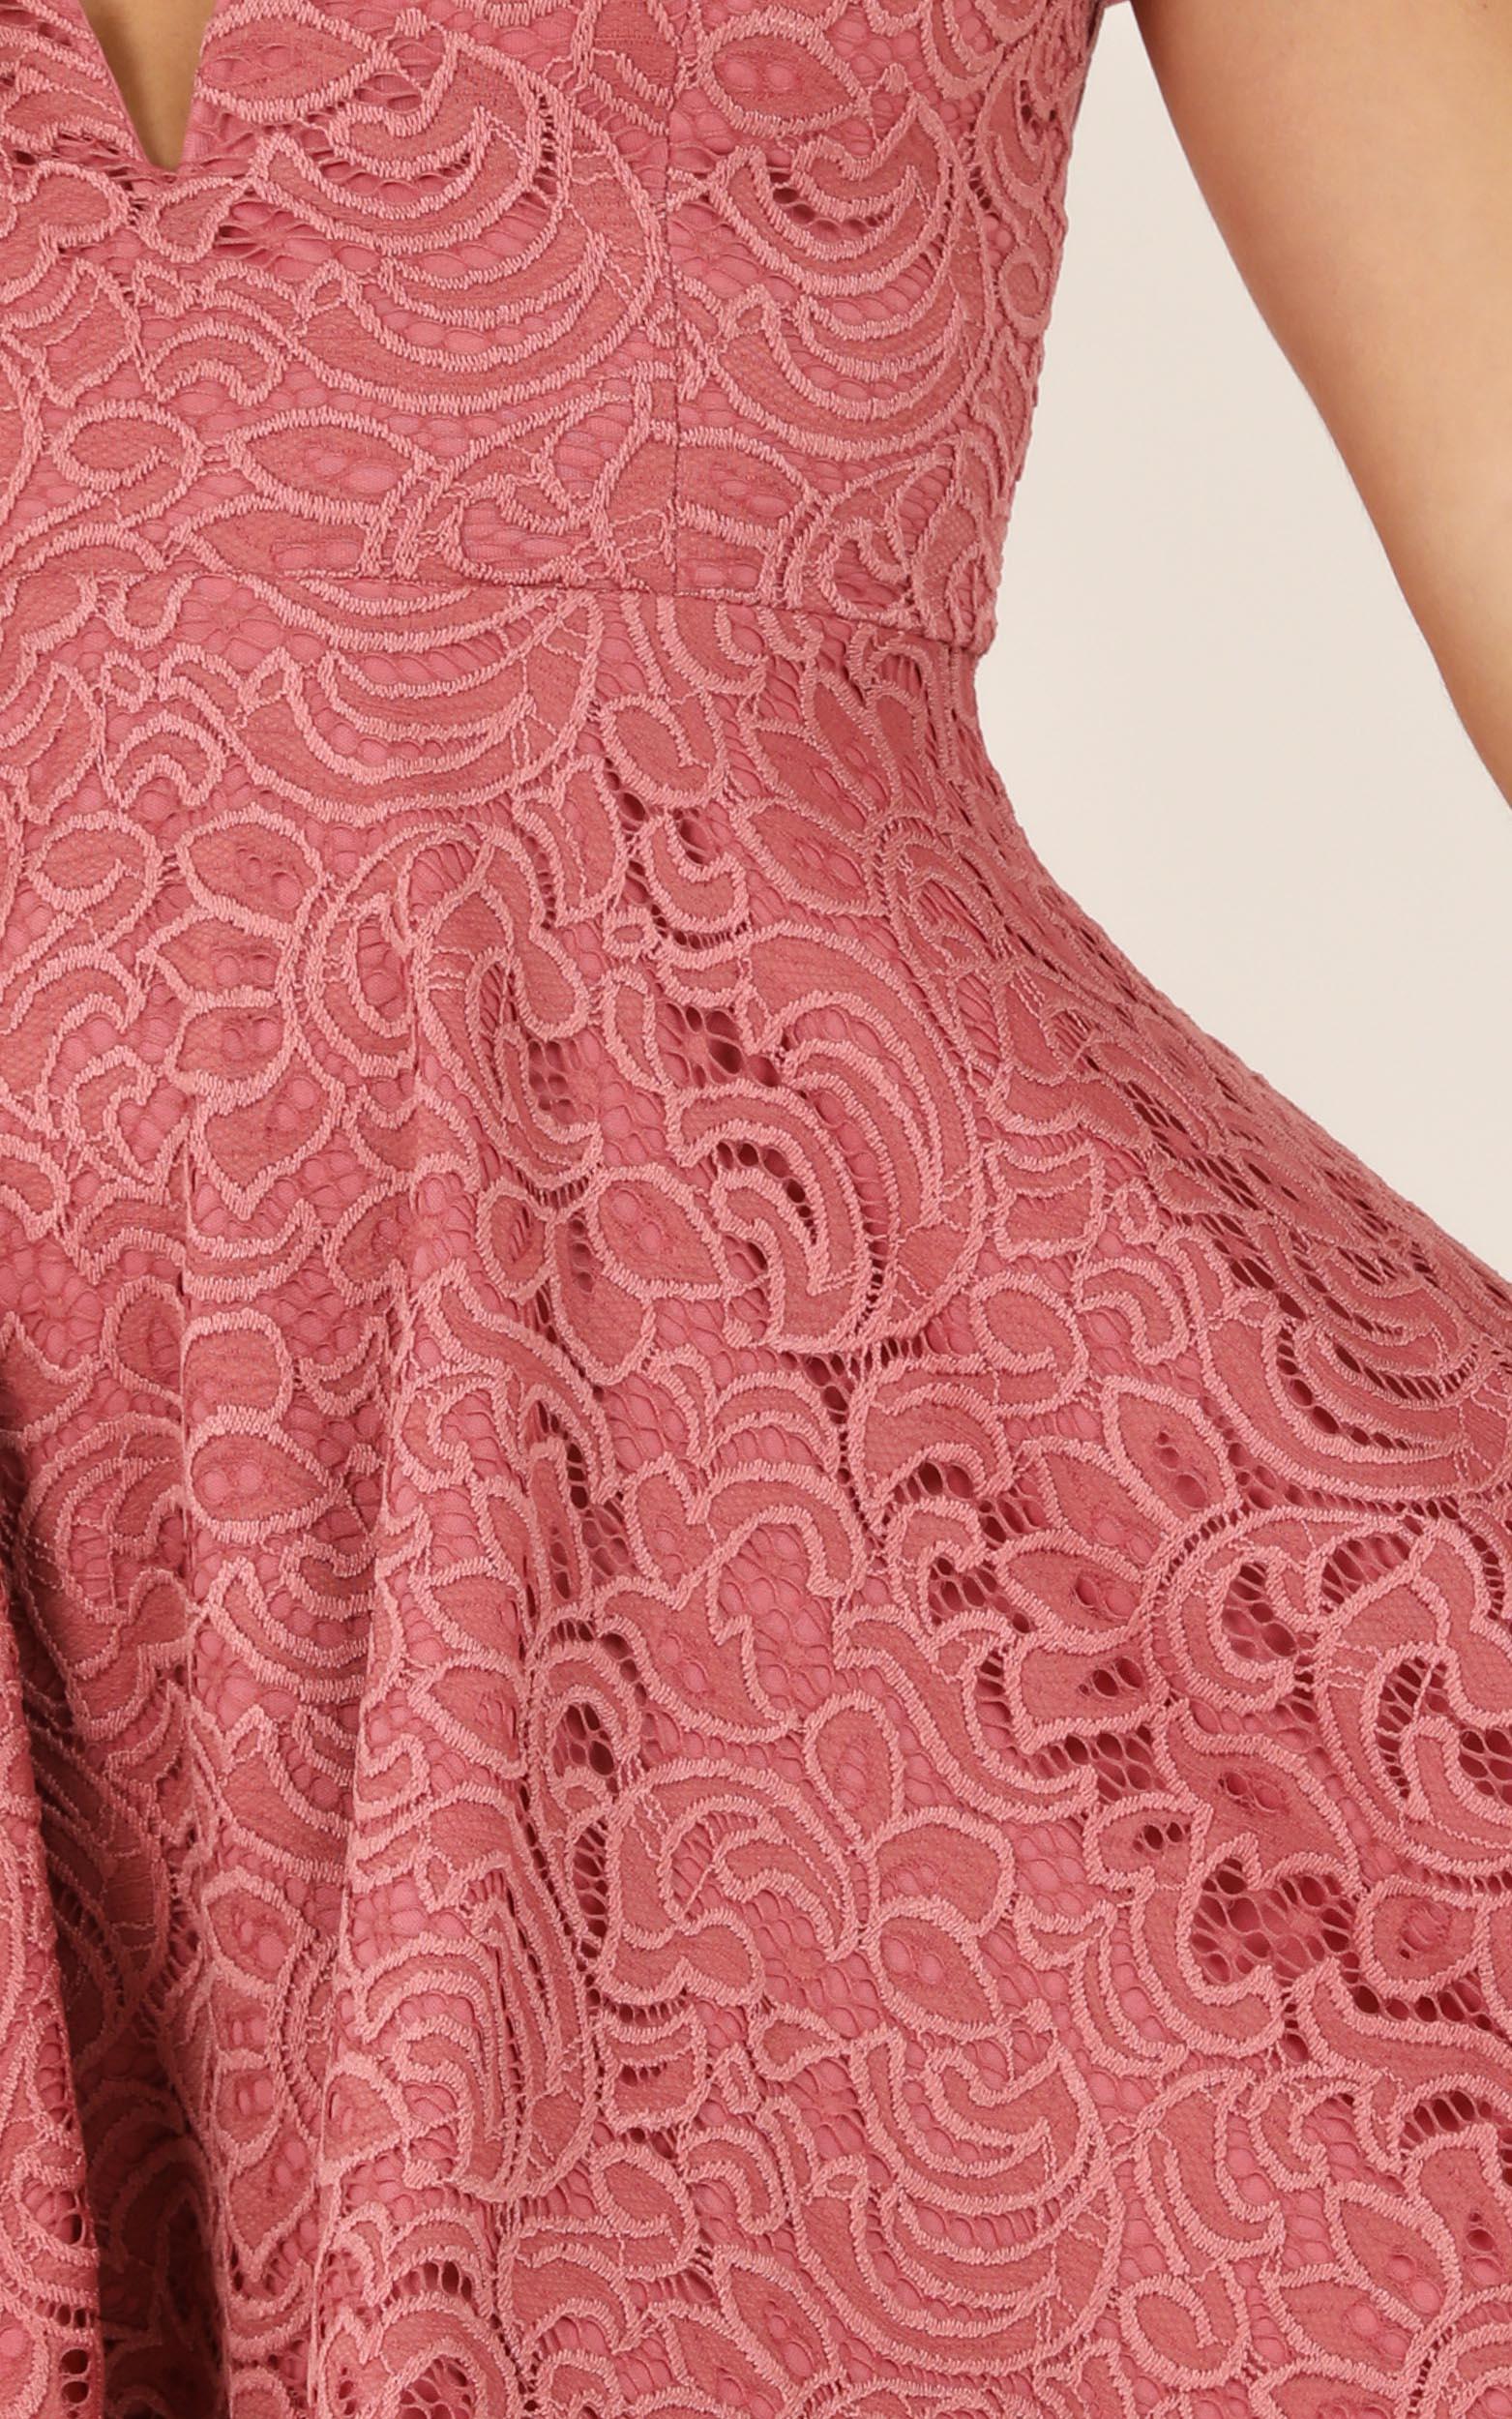 Subtle Hints dress in dusty rose - 12 (L), Pink, hi-res image number null